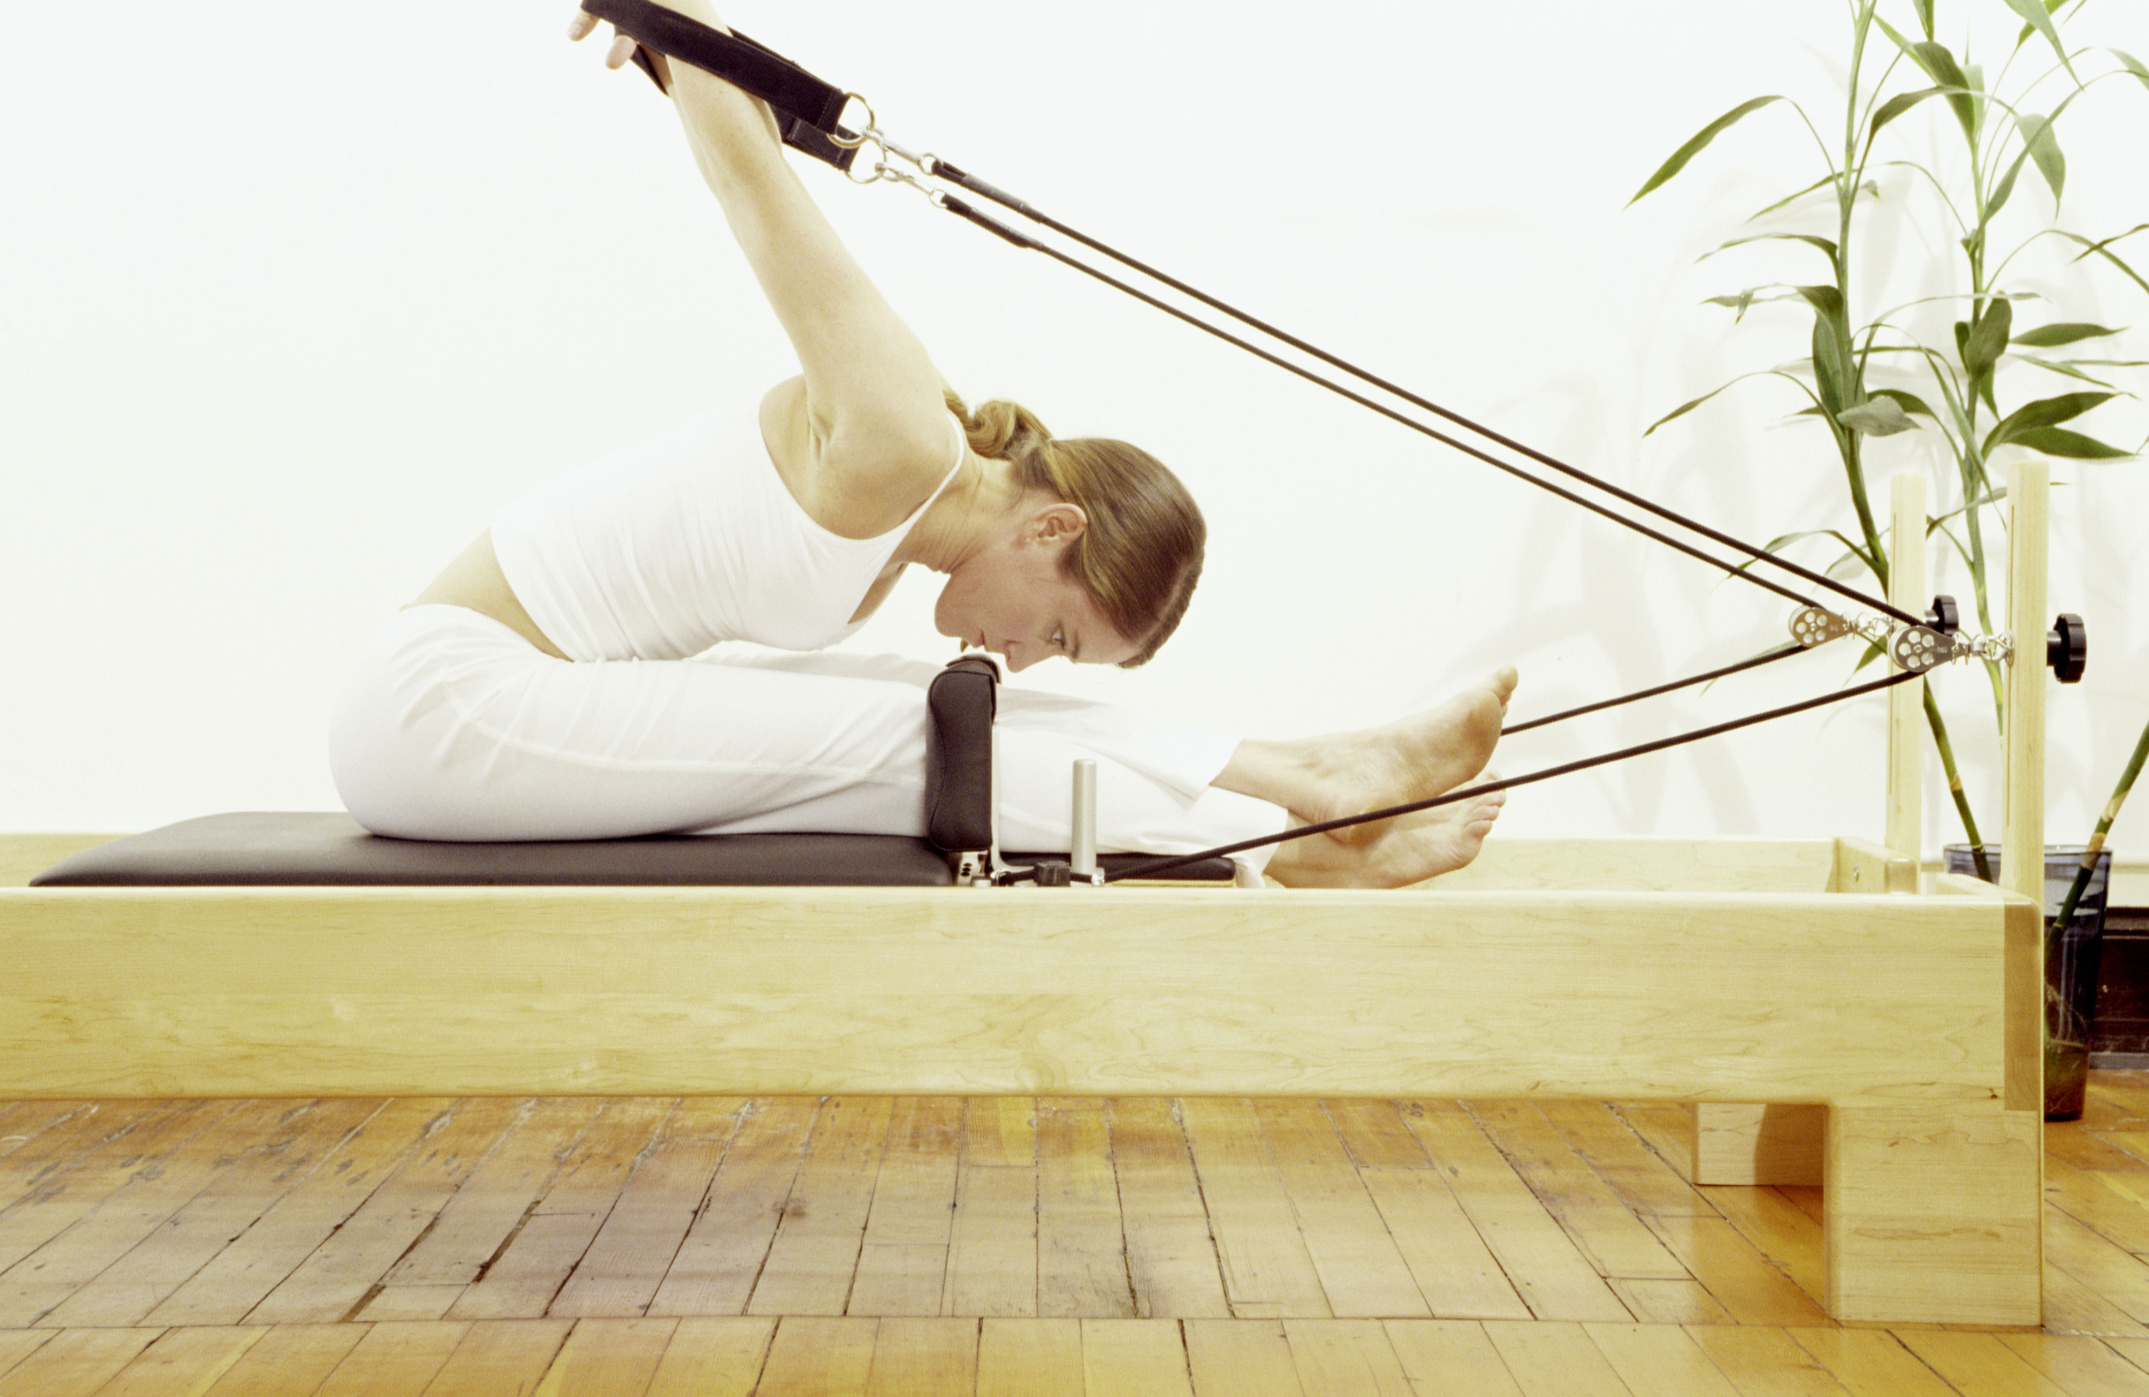 Pilates malibu chair buy malibu chair pilates combo - Pilates Malibu Chair Buy Malibu Chair Pilates Combo 84